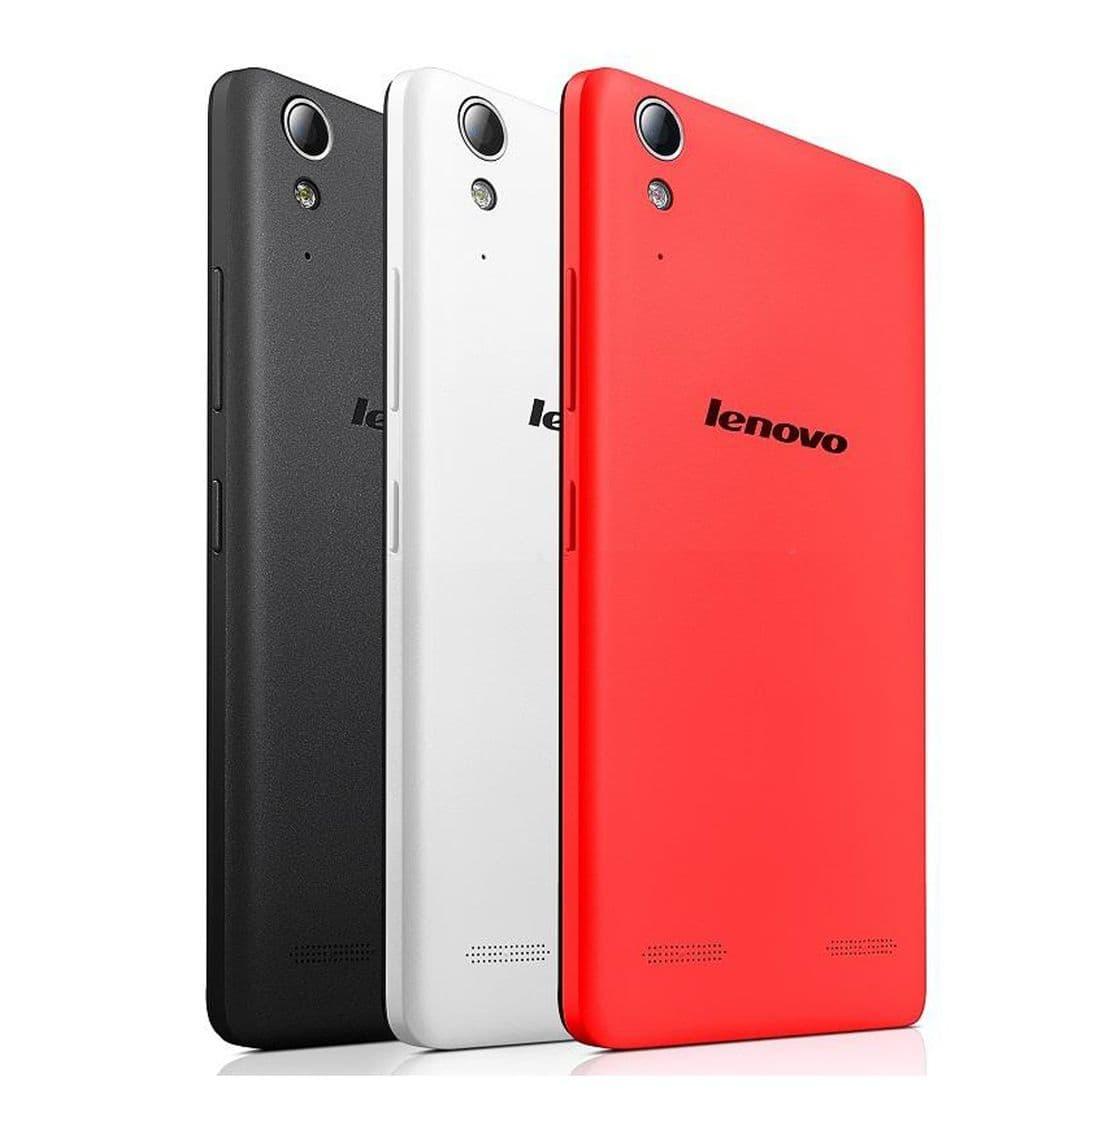 Lenovo A6010 Buy Smartphone  Compare Prices In Stores  Lenovo A6010